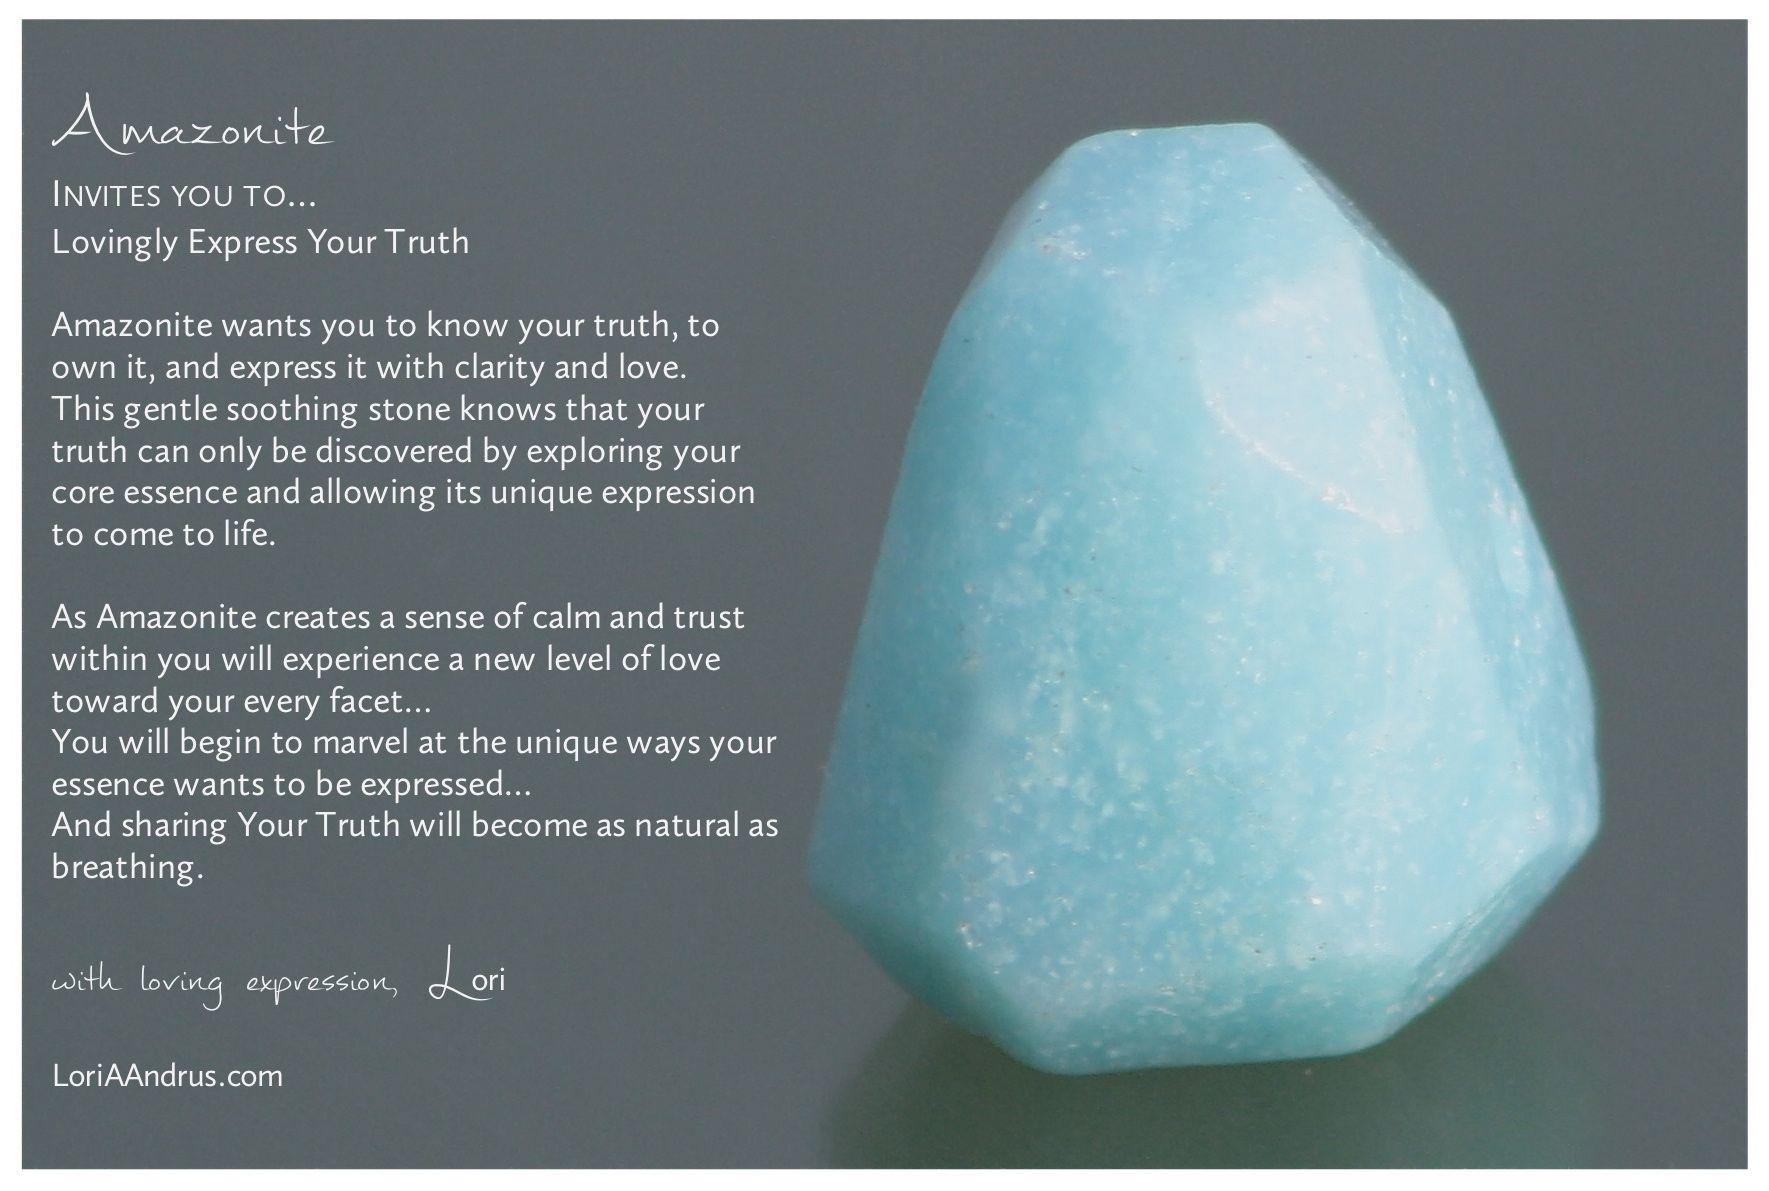 Amazonite A Stone Of Loving Expression Meditation Crystals